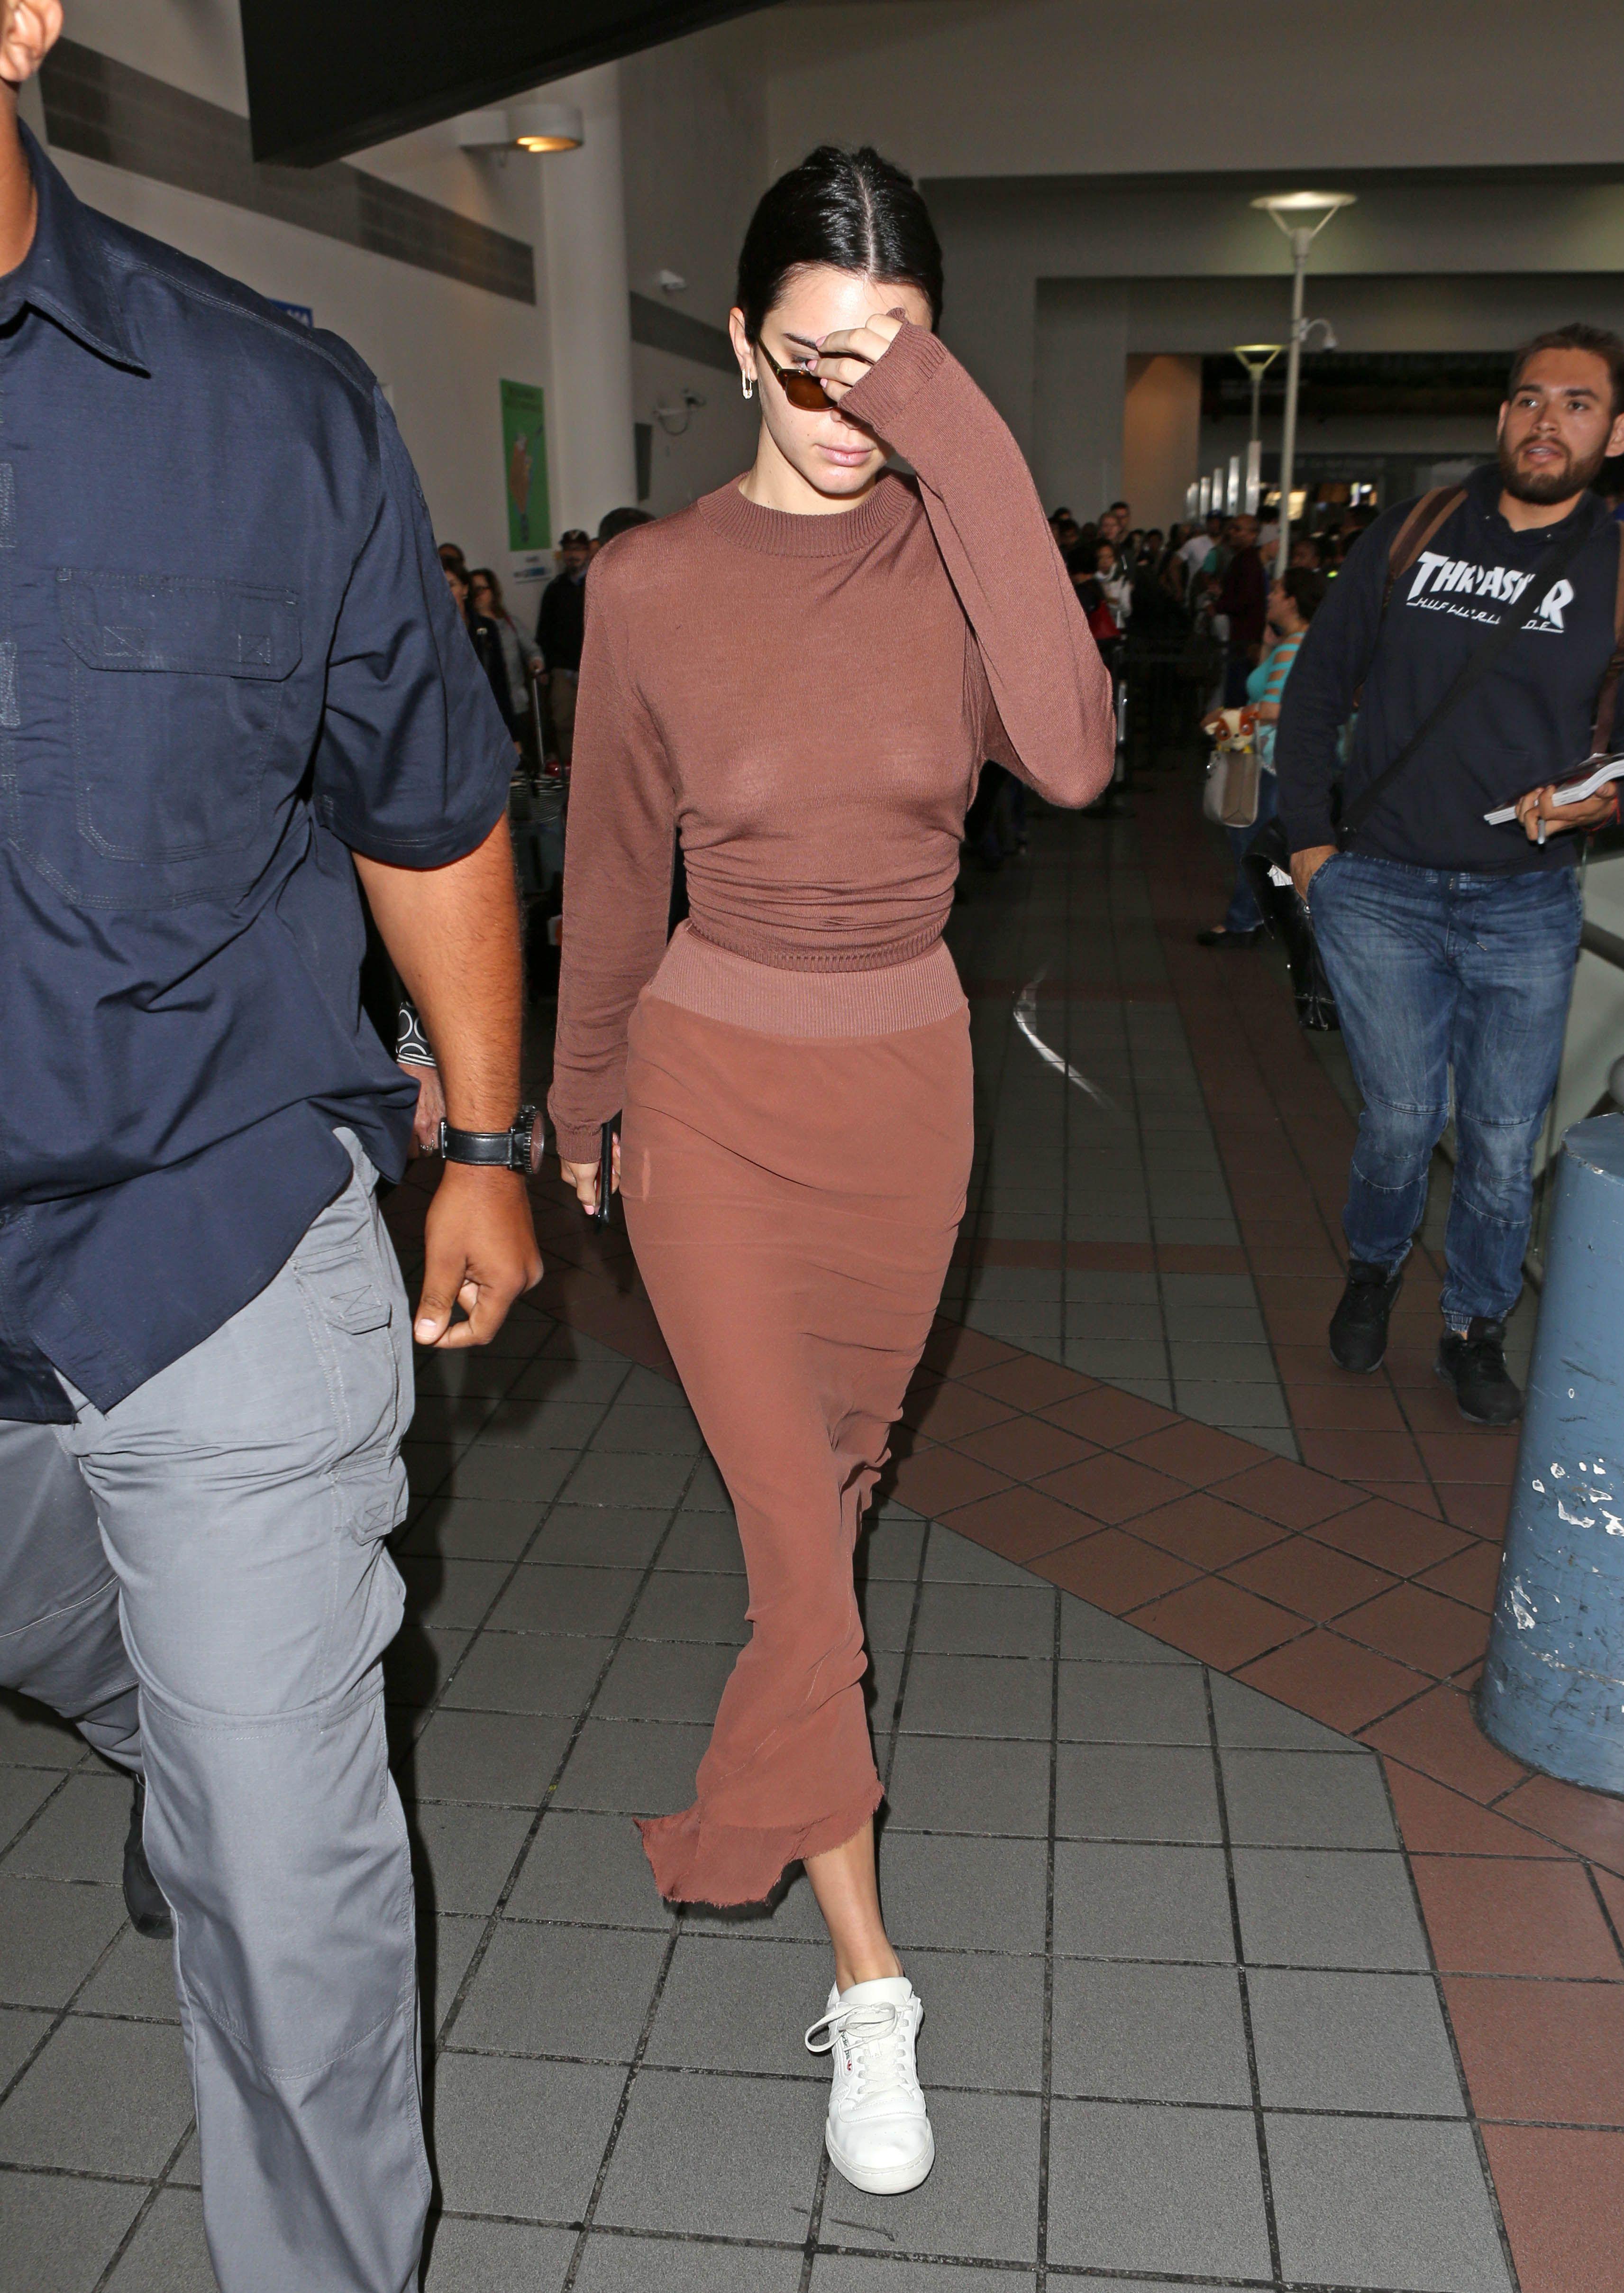 839de9924d62 Kendall Jenner Street Style - Kendall Jenner s Best Fashion Looks